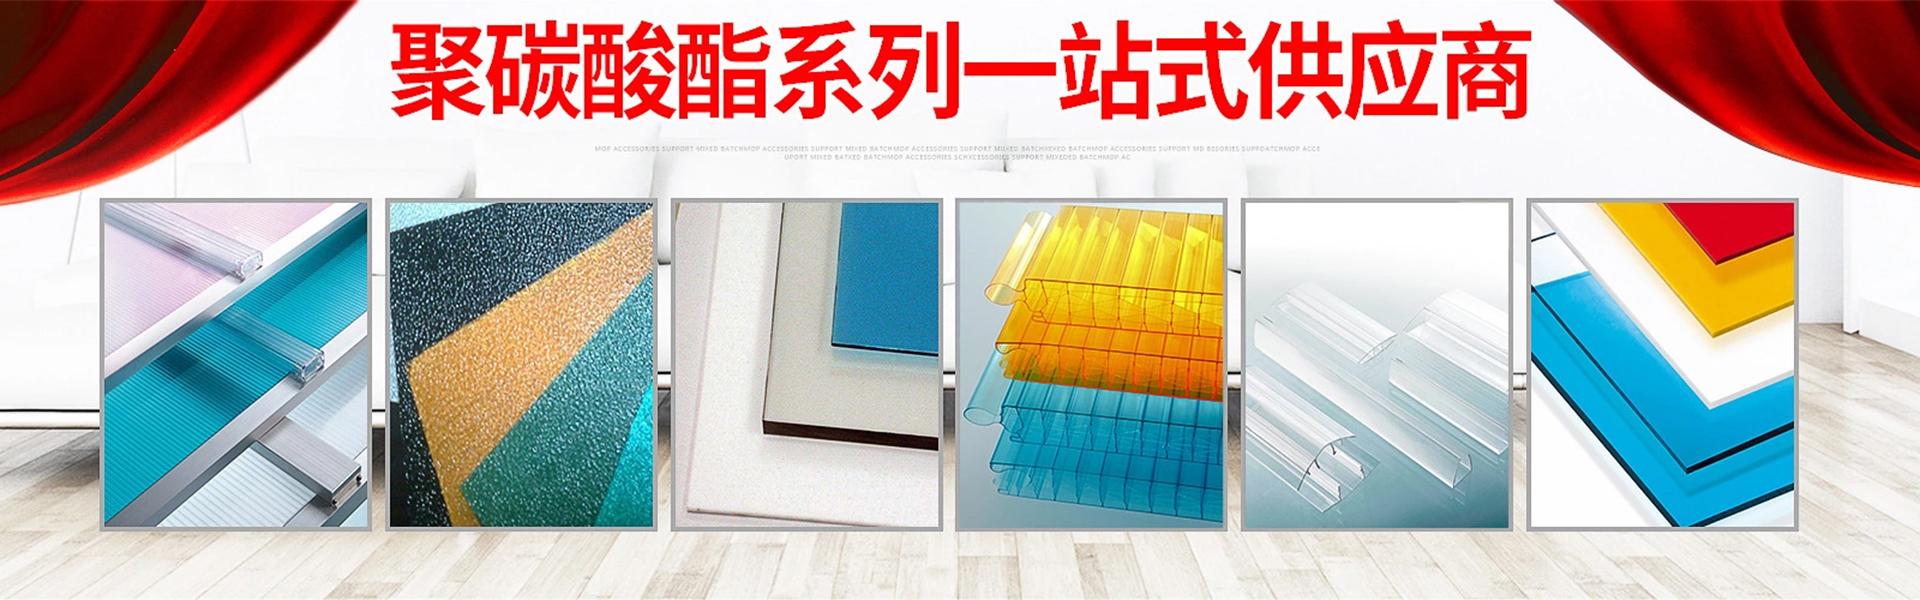 PC鎖扣板,插接陽光板,擴散板